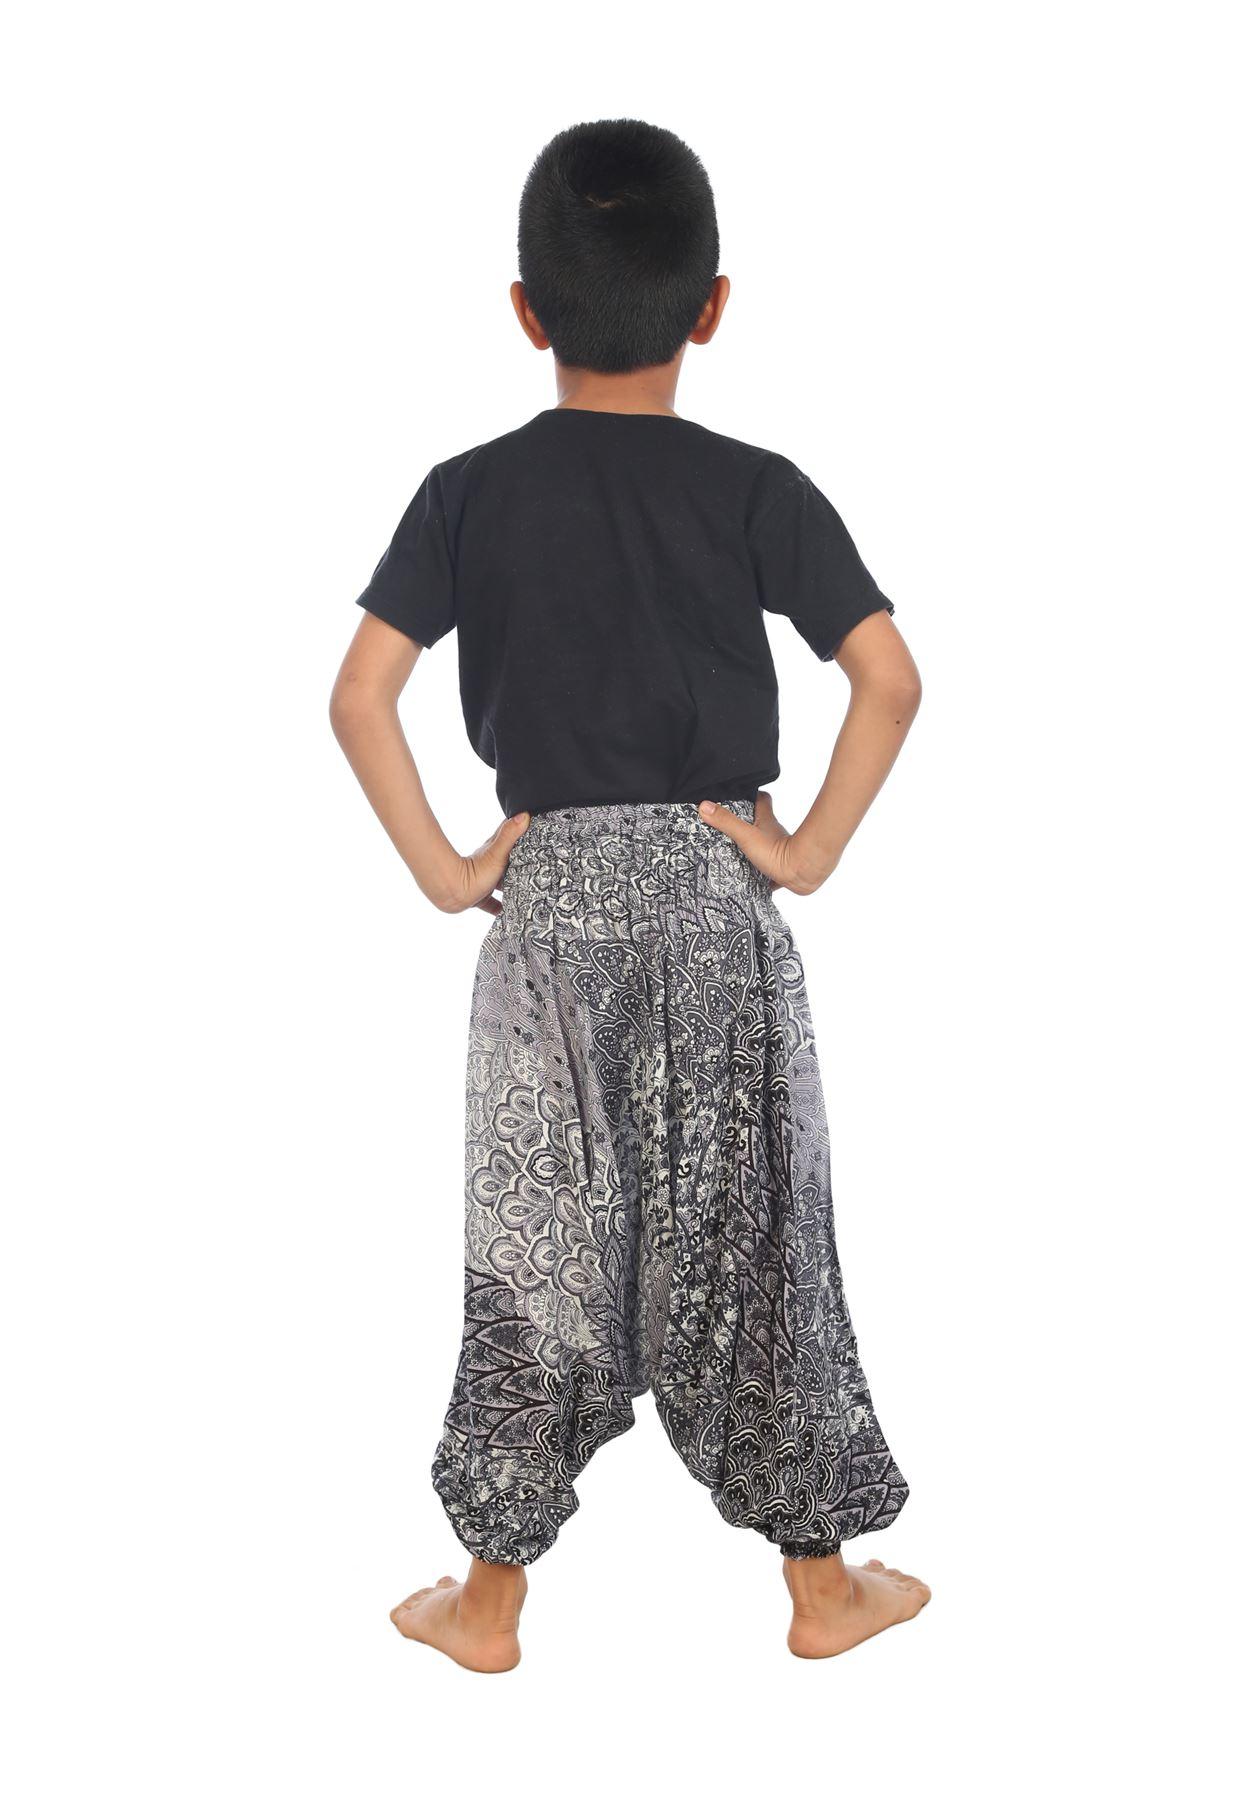 994010164 childrens fashion in the 40 s german - Ecosia